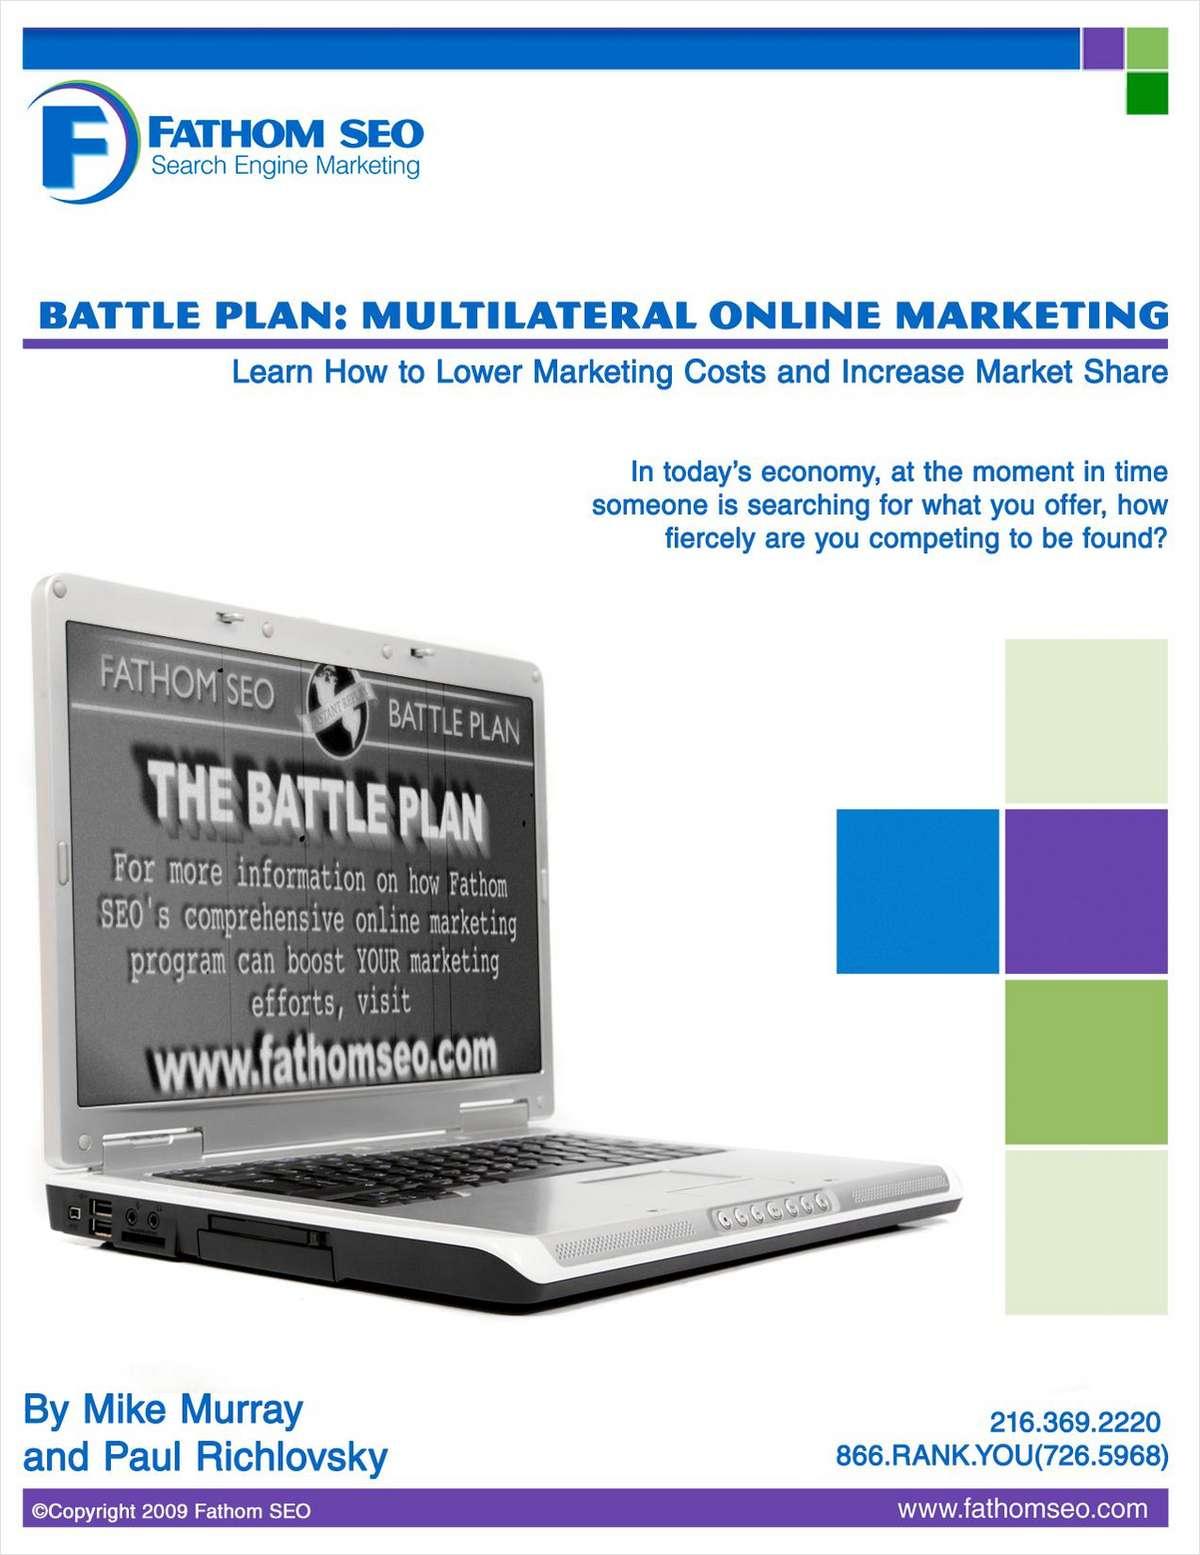 Battle Plan: Multilateral Online Marketing (MOM)